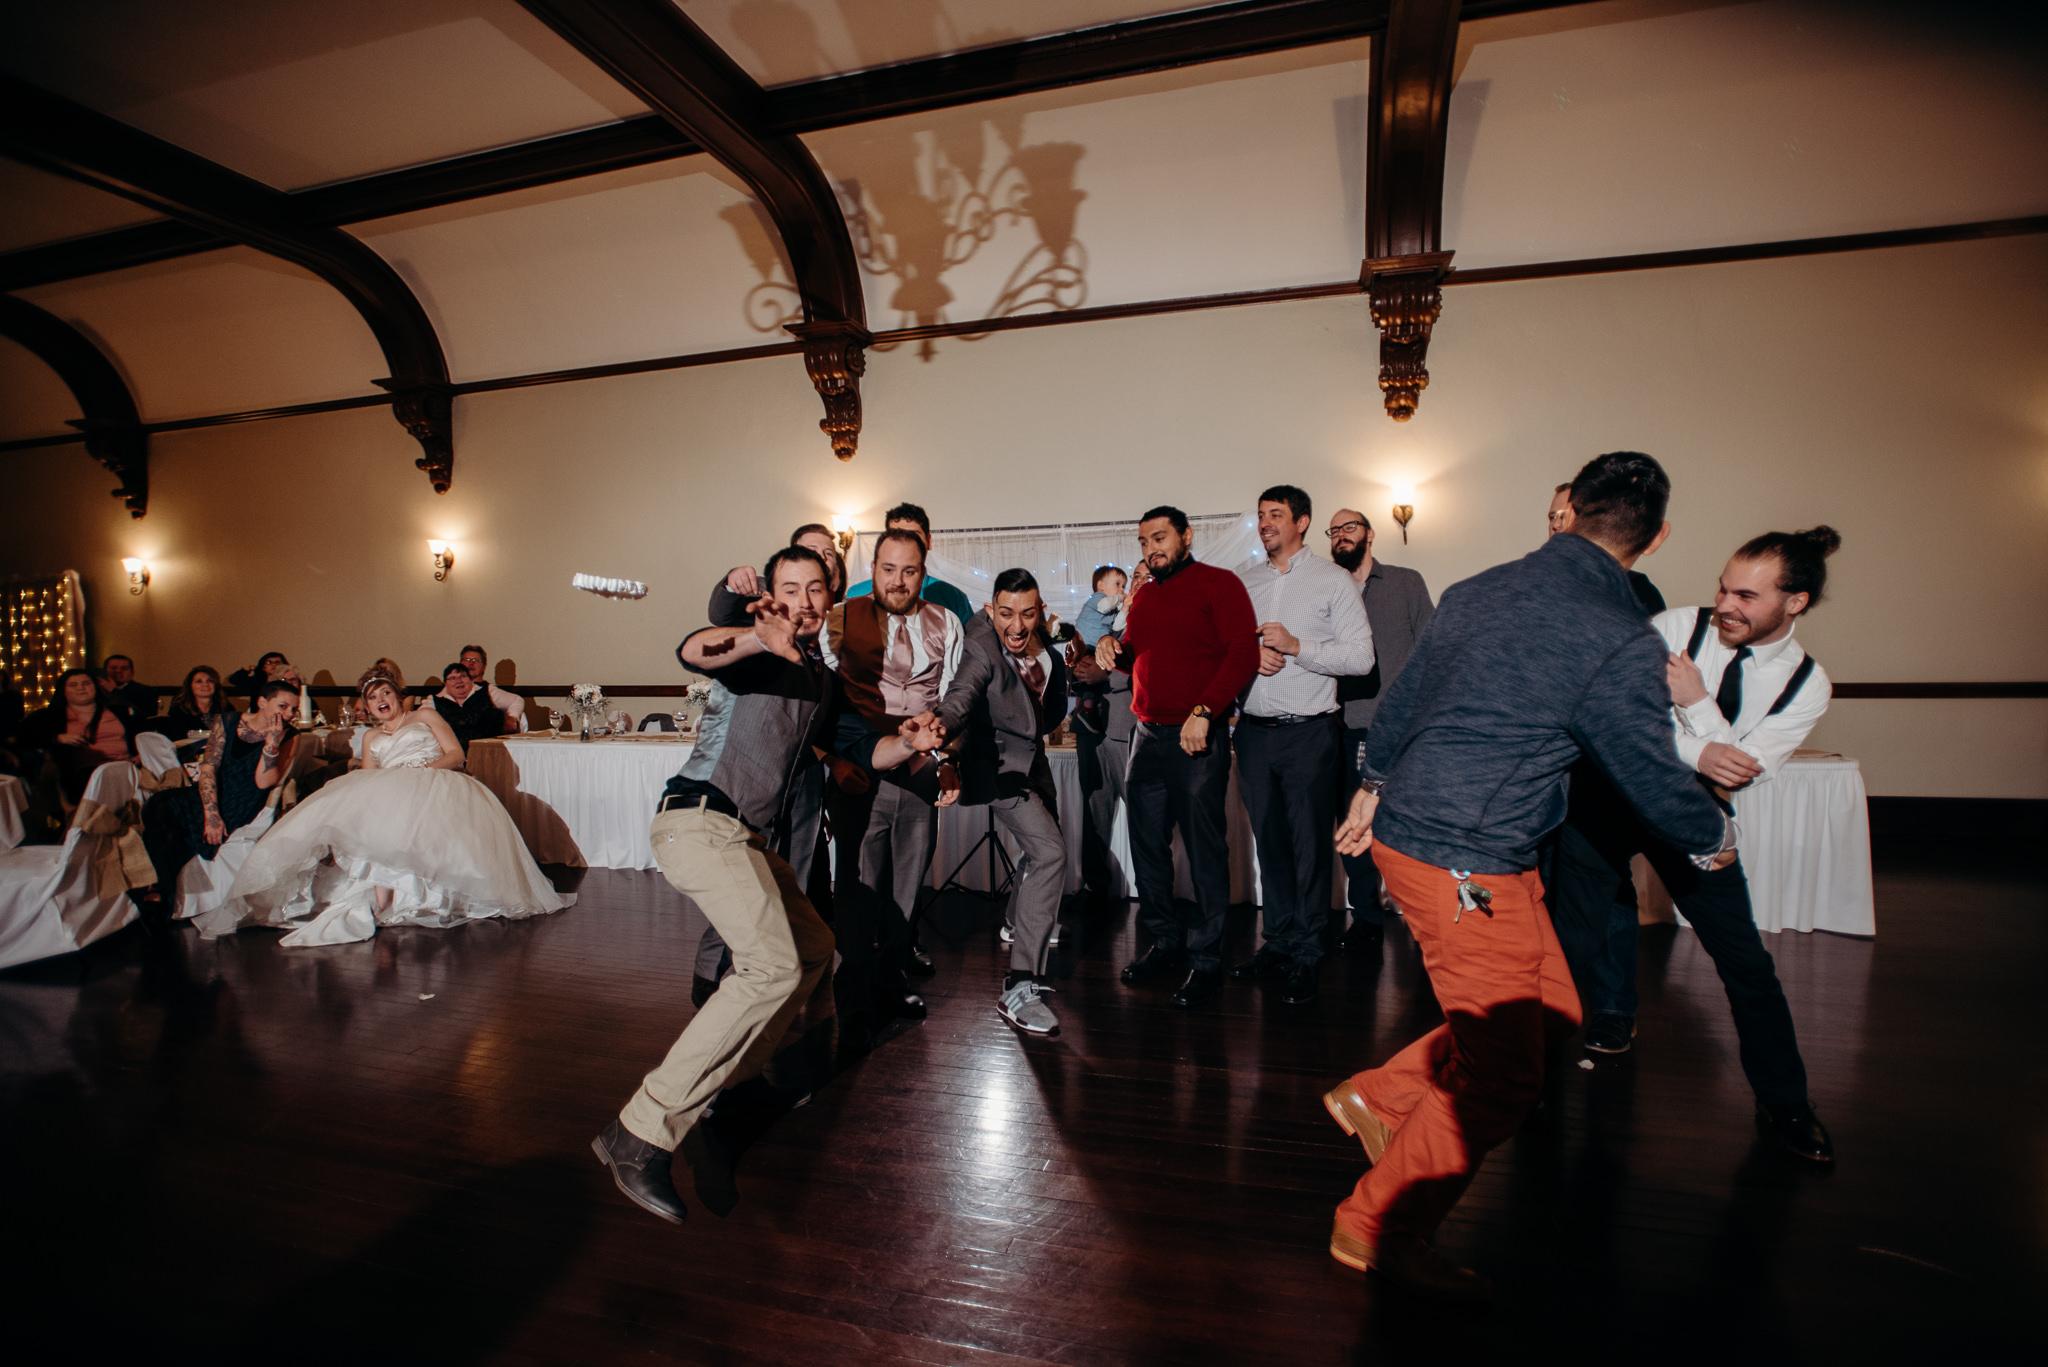 Grant Beachy Photo portrait wedding goshen elkhart south bend chicago-049.jpg